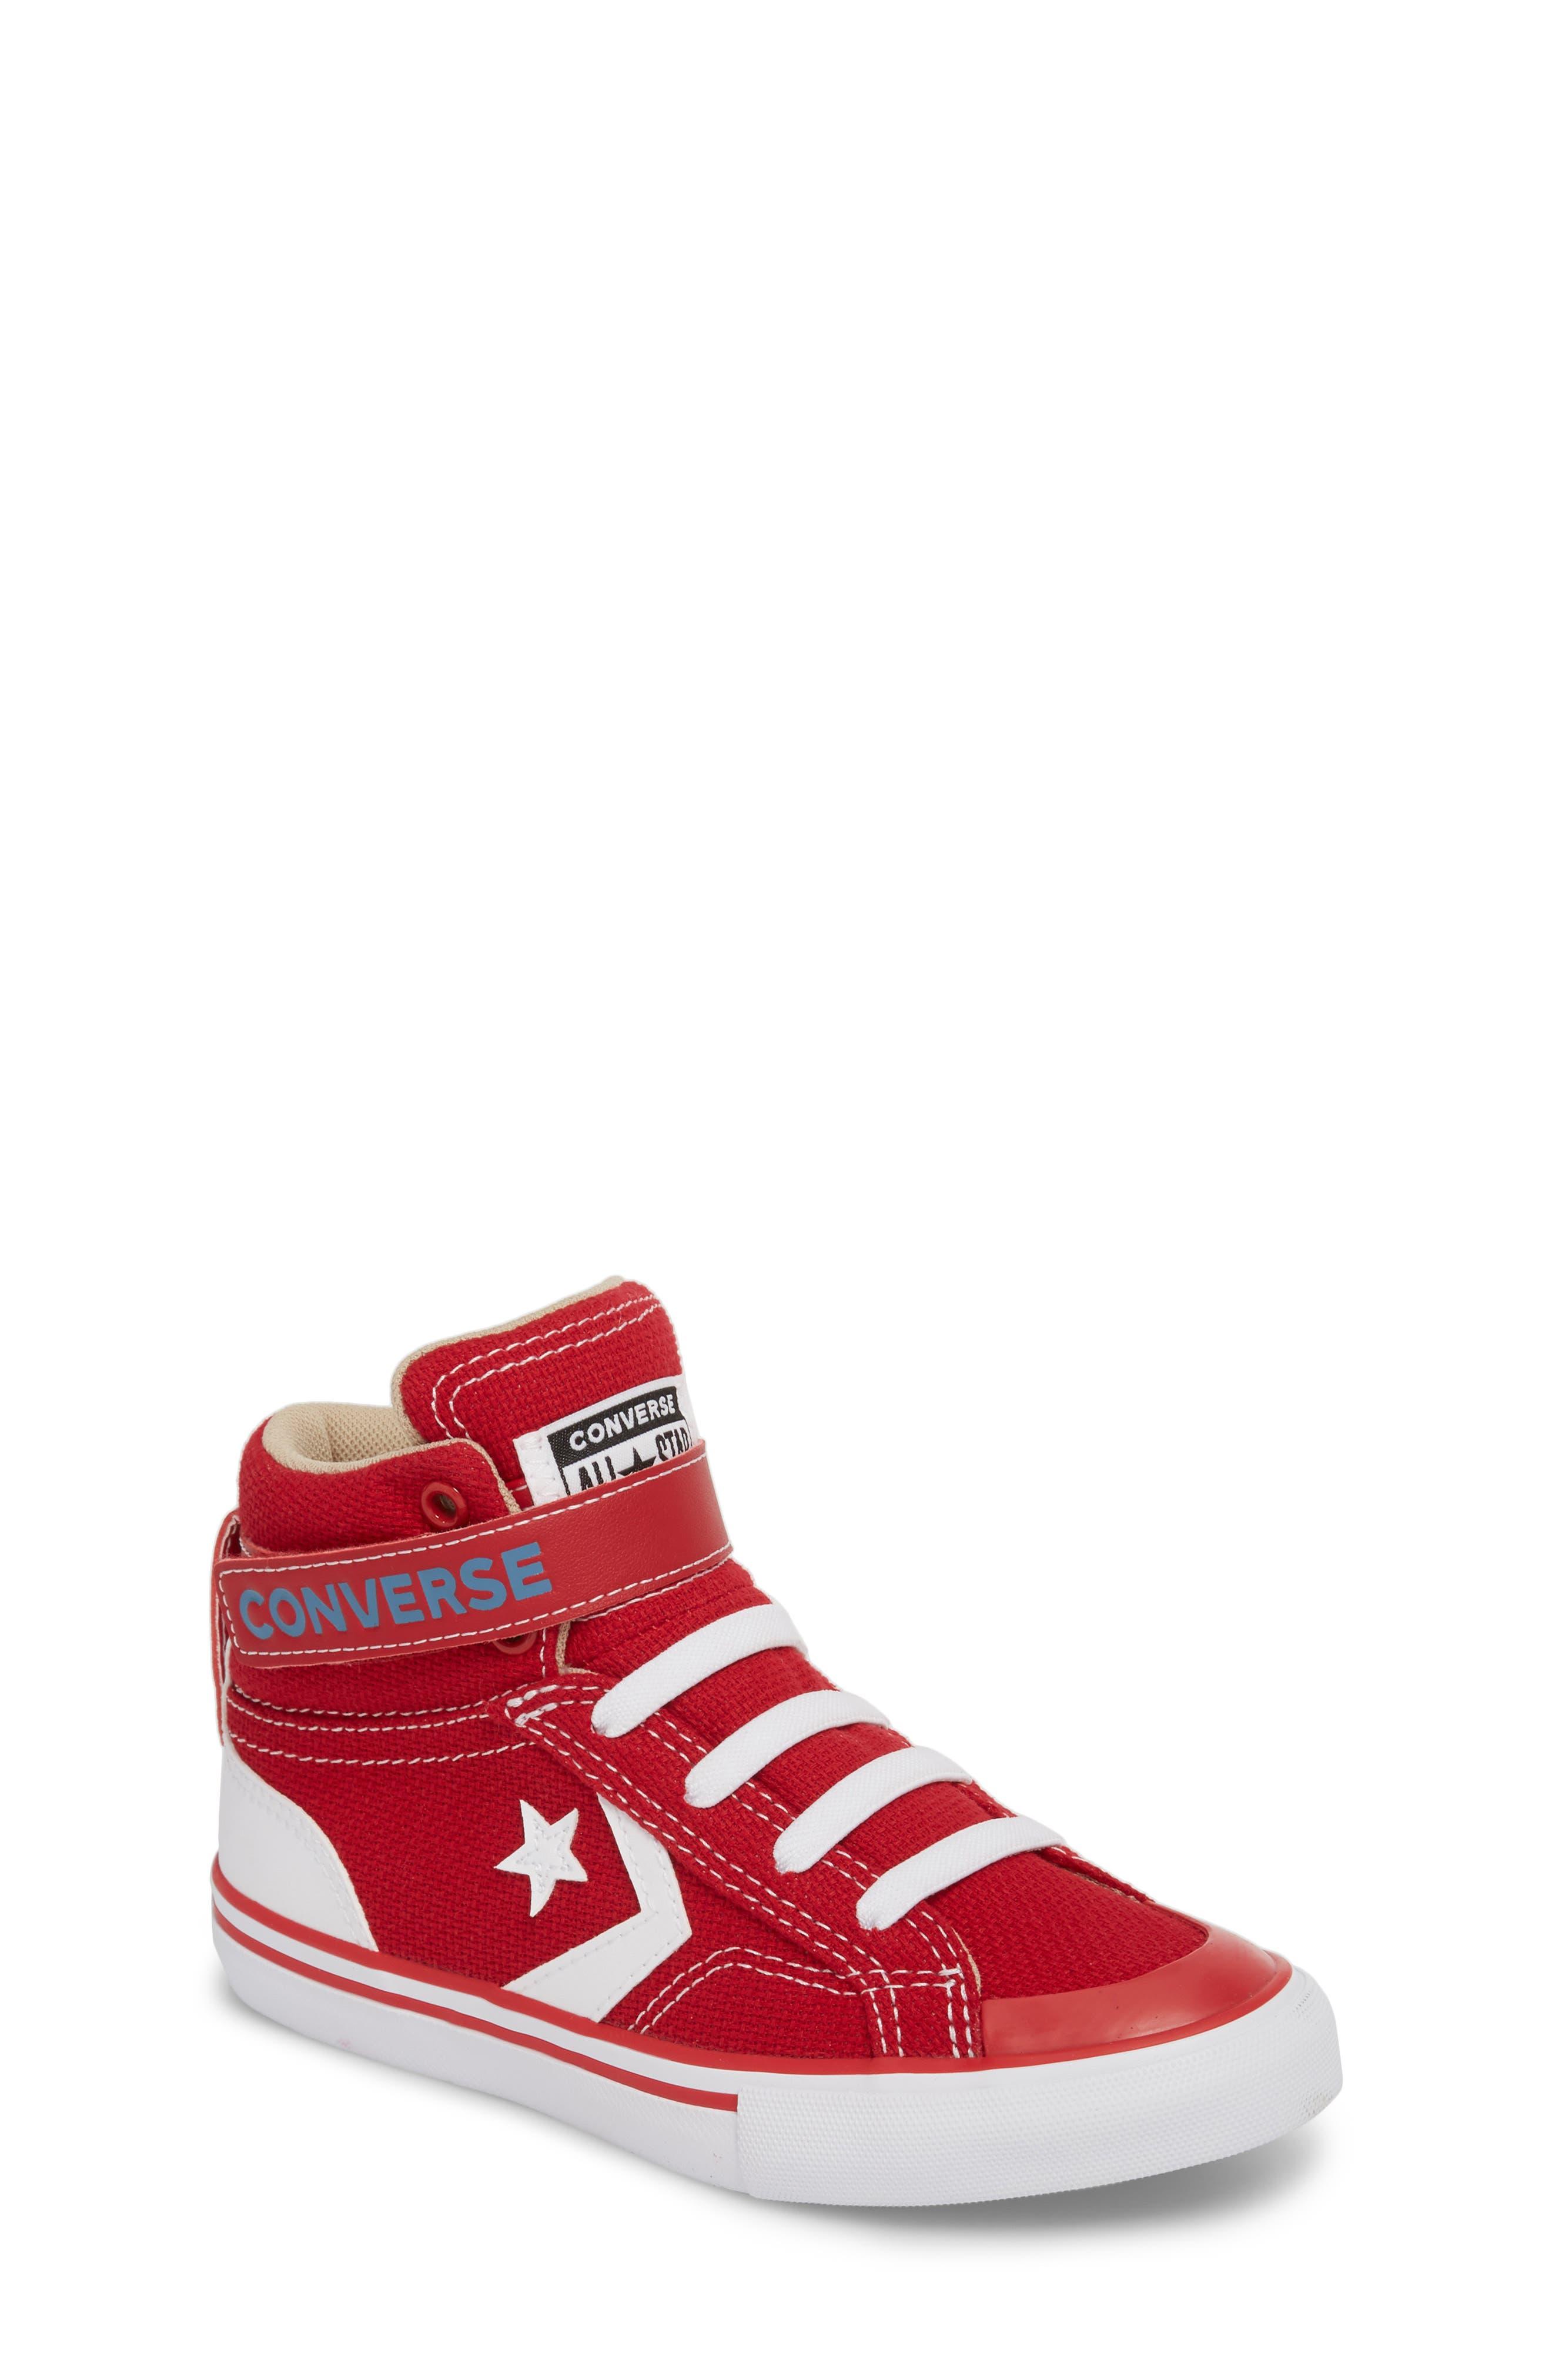 Converse Pro Blaze High Top Sneaker (Toddler, Little Kid & Big Kid)